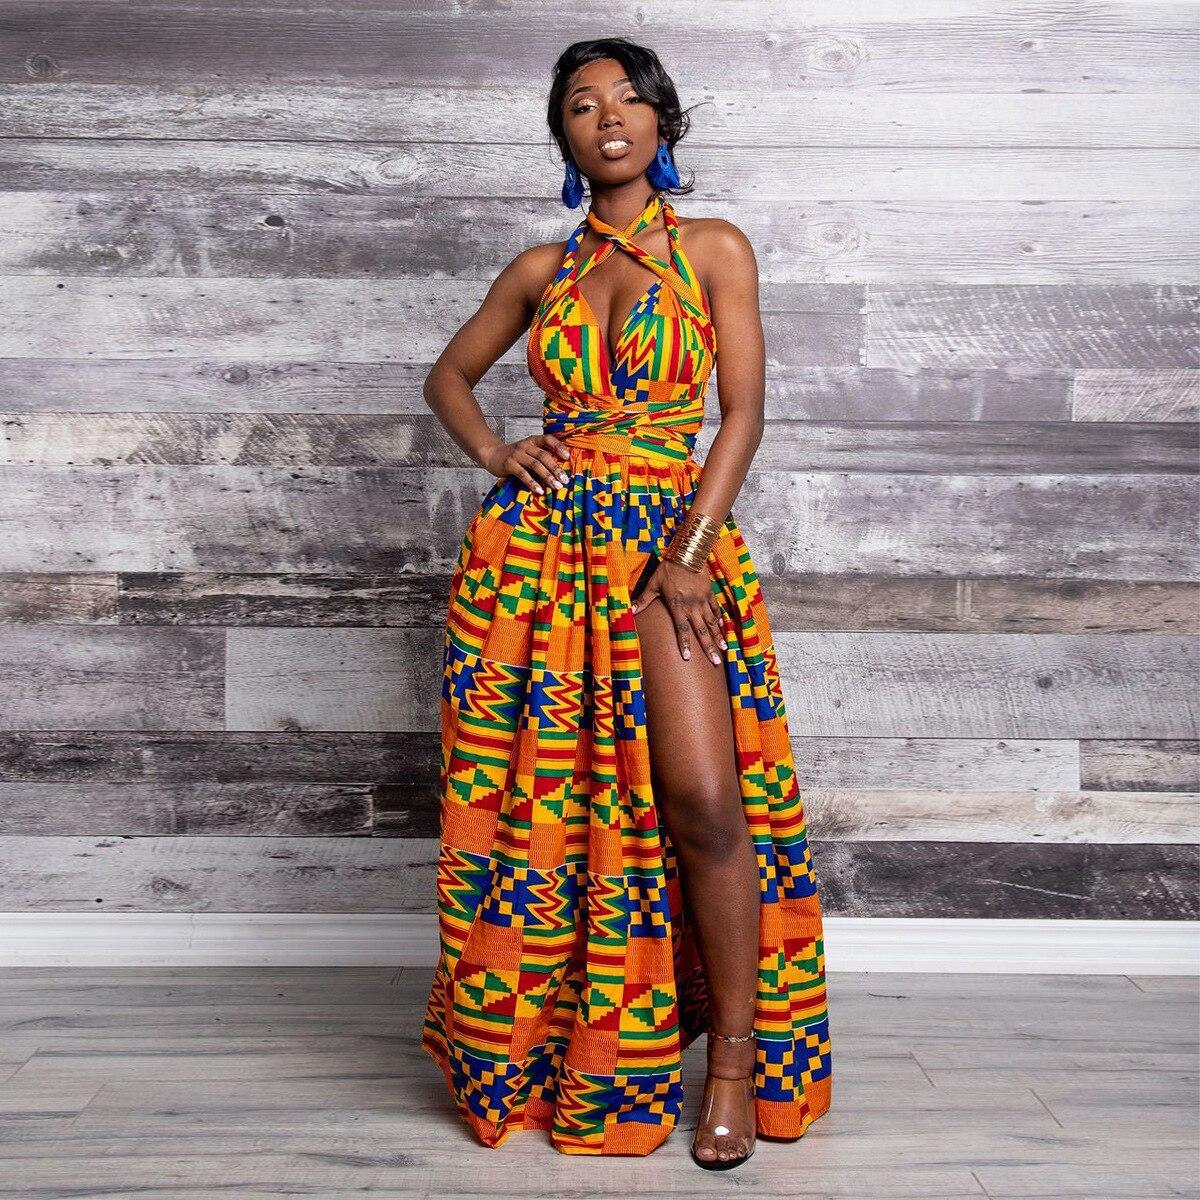 2020 African Dresses For Women Dashiki Cotton Wax Print Batik Sexy Long Dress For Femal Traditional Clothing Ankara Dresses